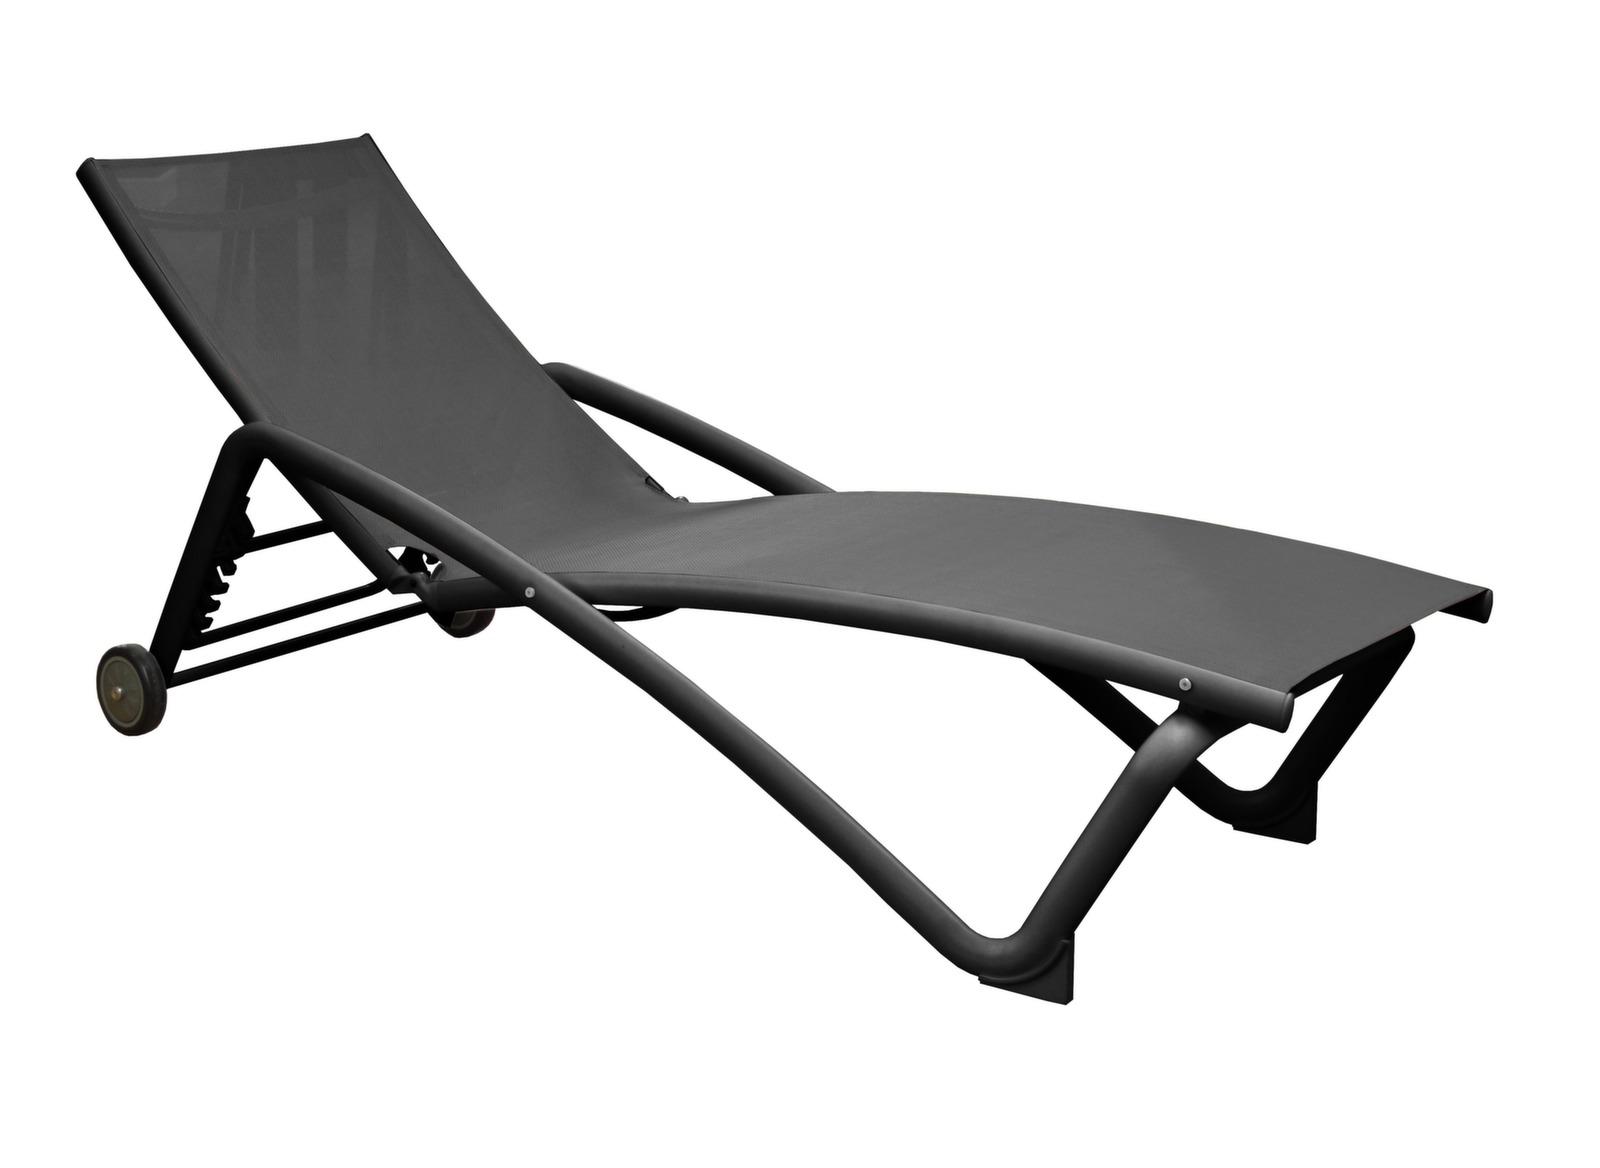 Bain de soleil zo gris en alu mobilier de jardin for Mobilier de jardin gris